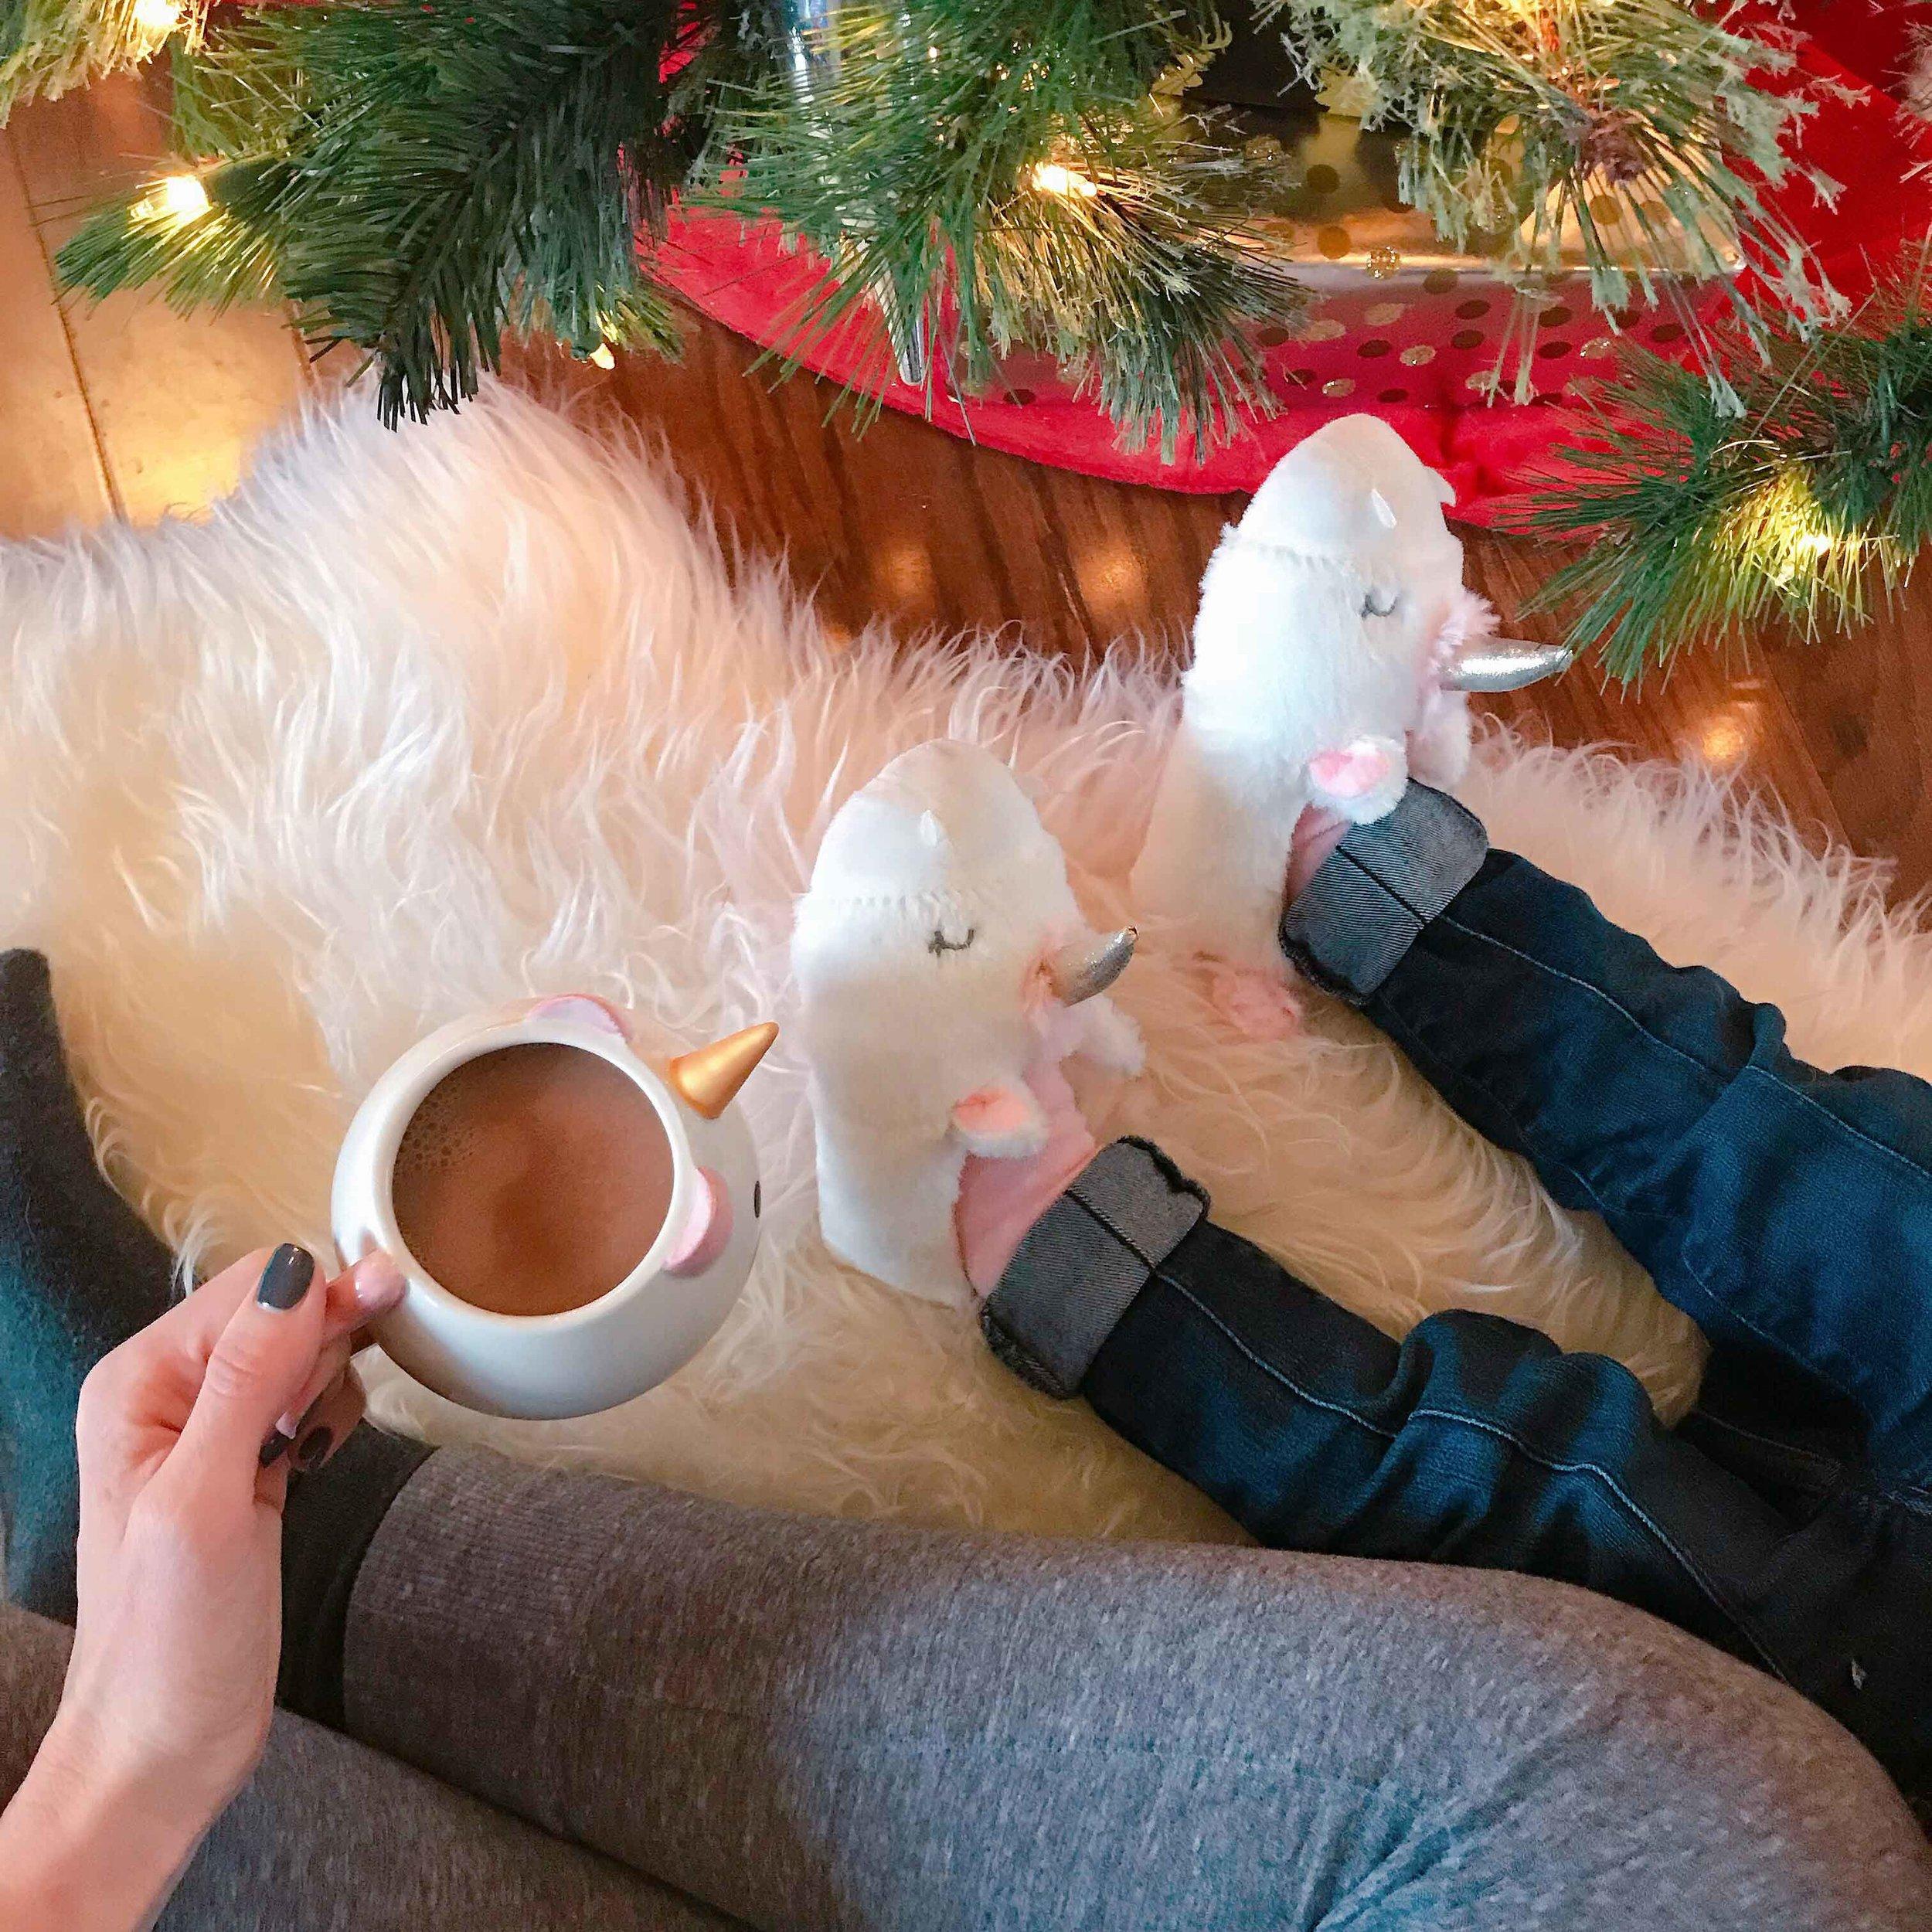 ashly-locklin-healthy-hot-chocolate-fuzzy-slippers.jpg